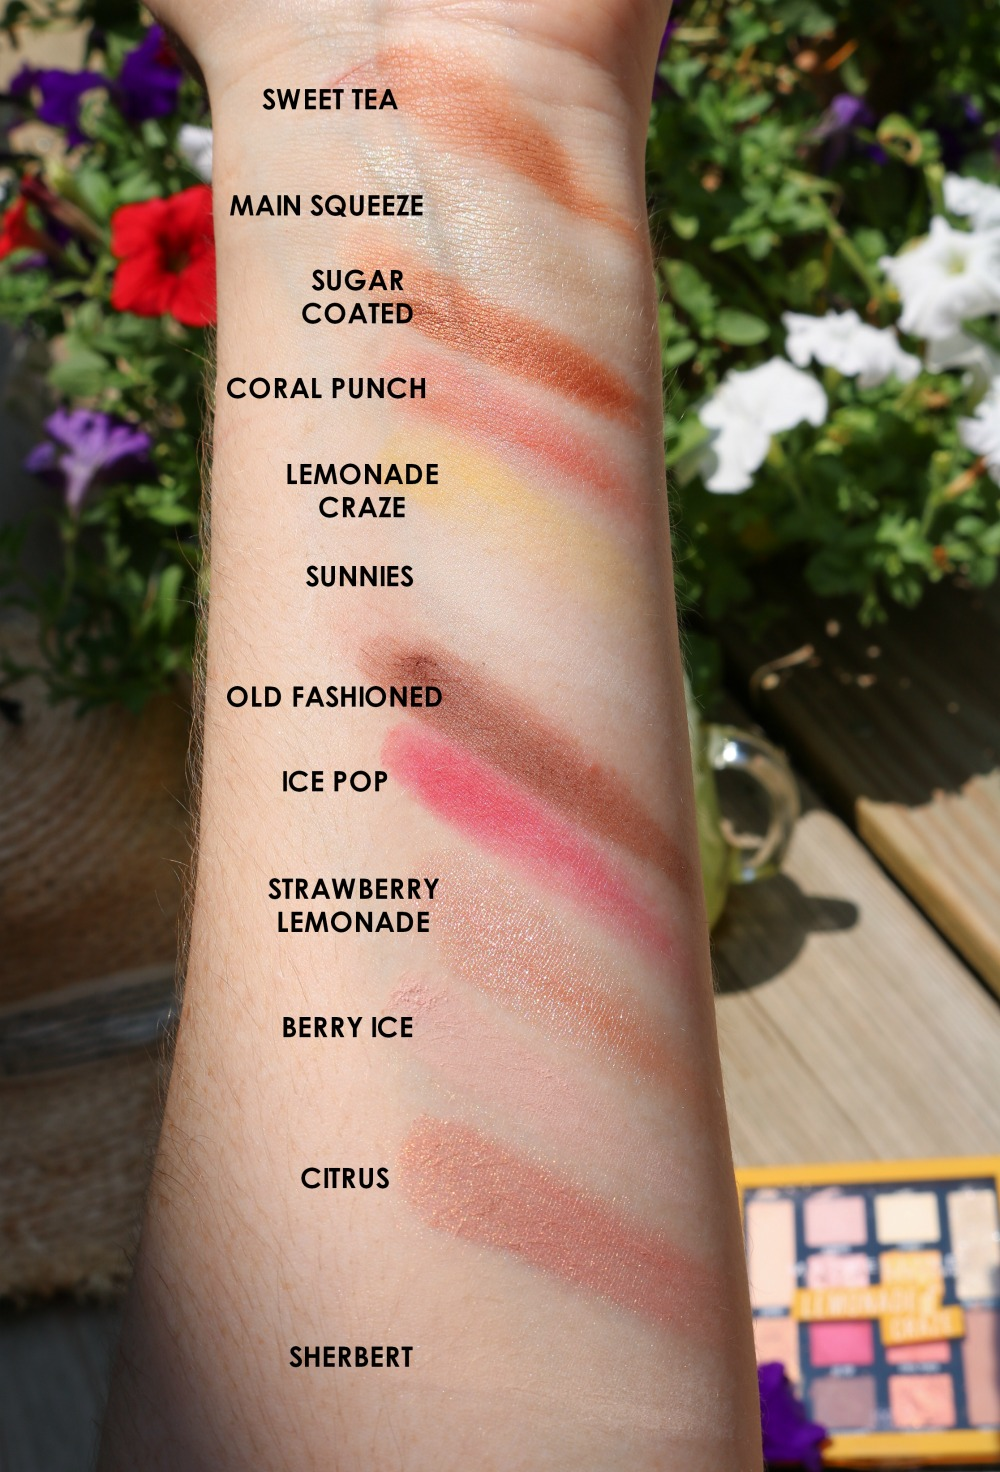 Maybelline Lemonade Craze Eyeshadow Palette Review I DreaminLace.com #Maybelline #DrugstoreMakeup #SummerMakeup #BeautyBlogger